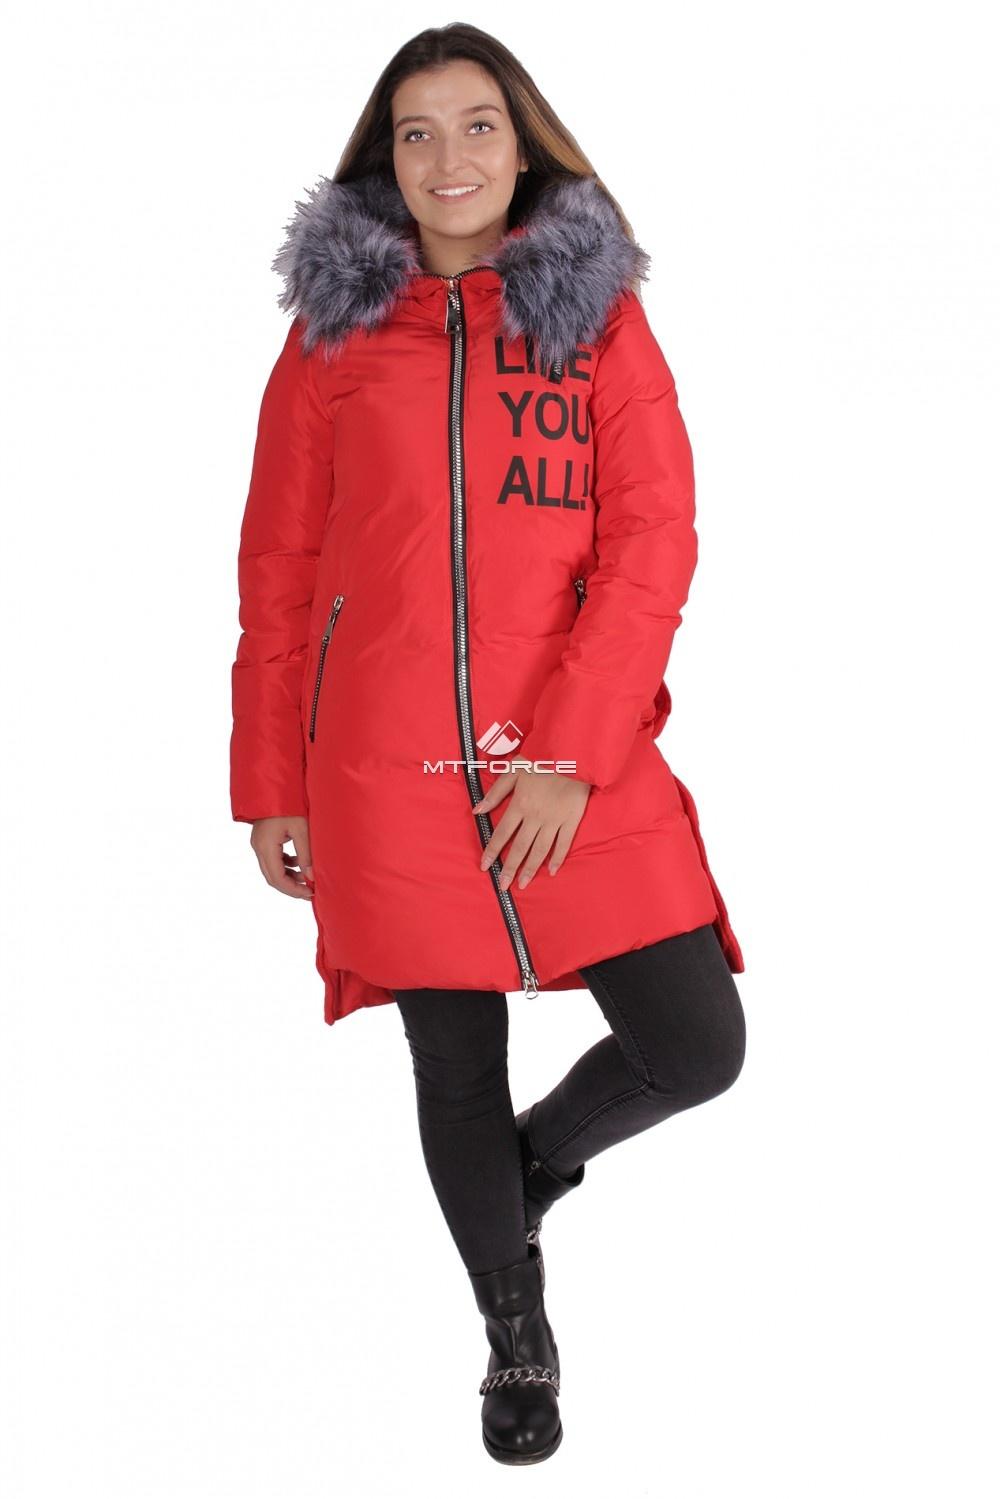 Купить                                      оптом Пуховик ТРЕНД женский зимний красного цвета 16092Kr в Новосибирске